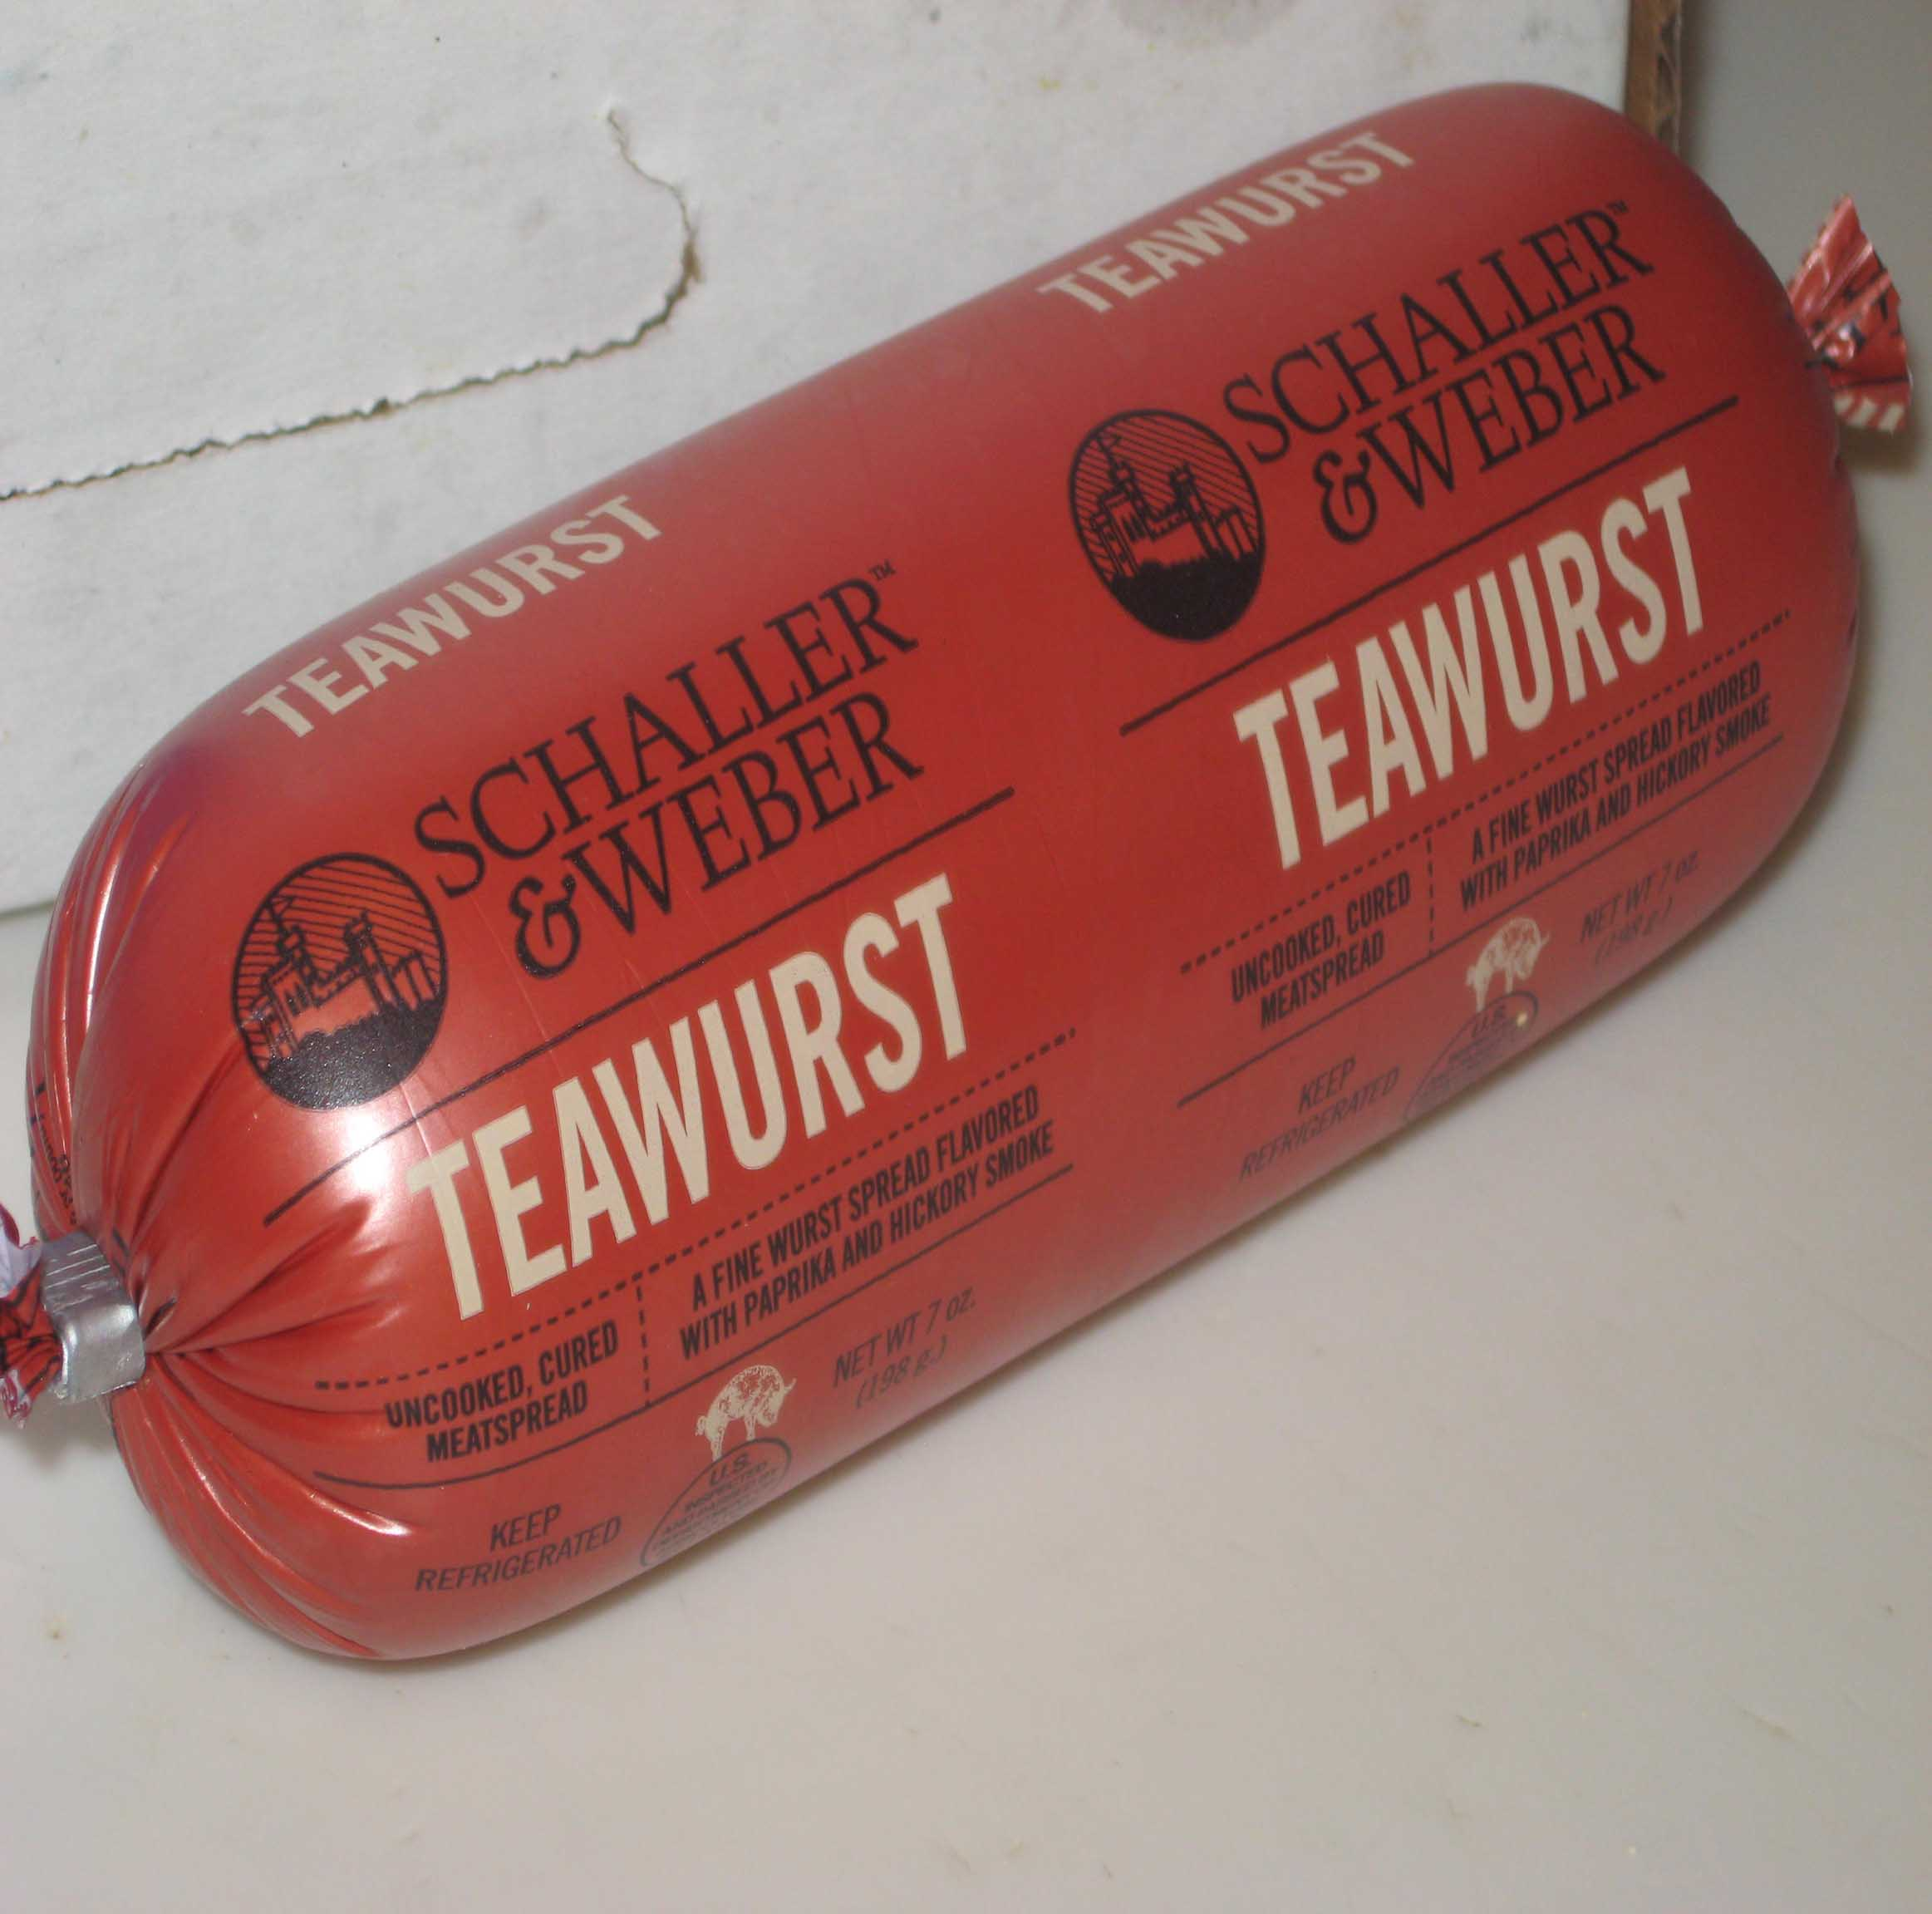 Teewurst – Smoked Ham Spread